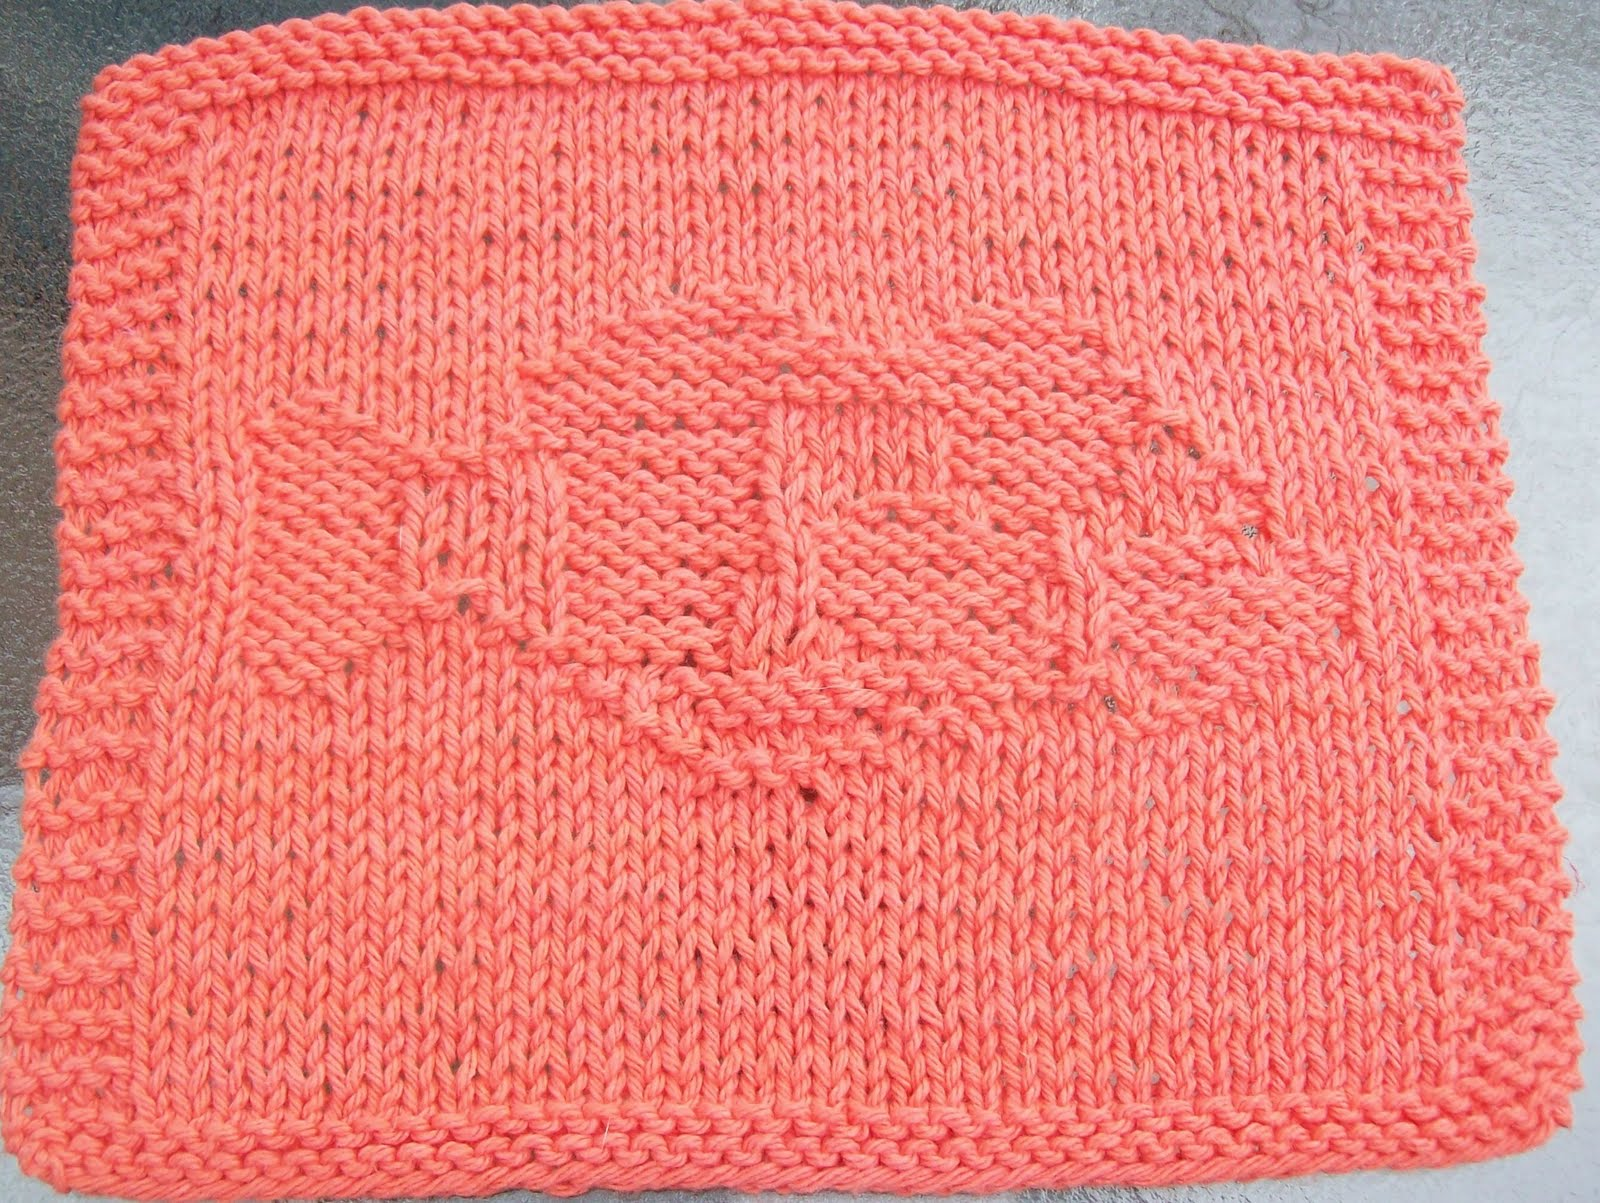 DigKnitty Designs: Clown Fish Knit Dishcloth Pattern